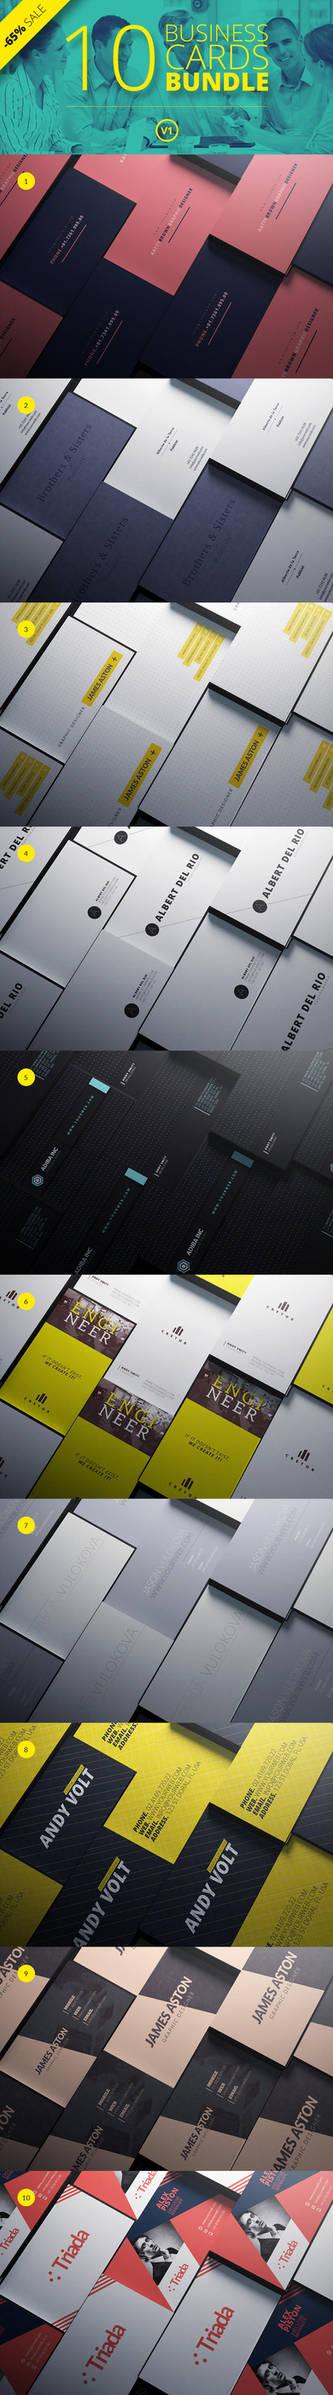 10 Business Cards Bundle V1 by cooledition